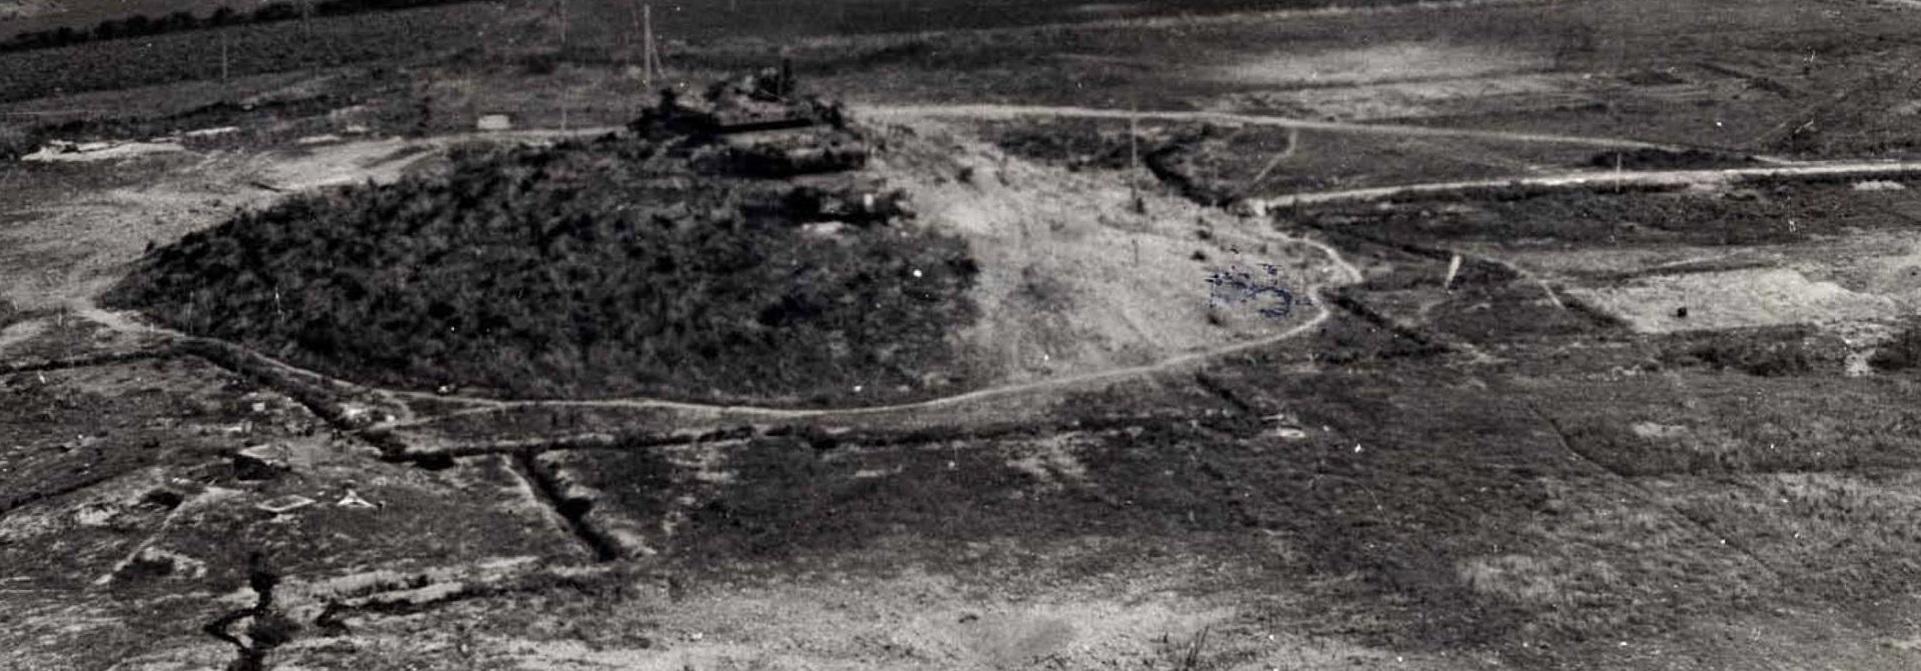 musee memoires 39-45 plougonvelin 1944 graff spee